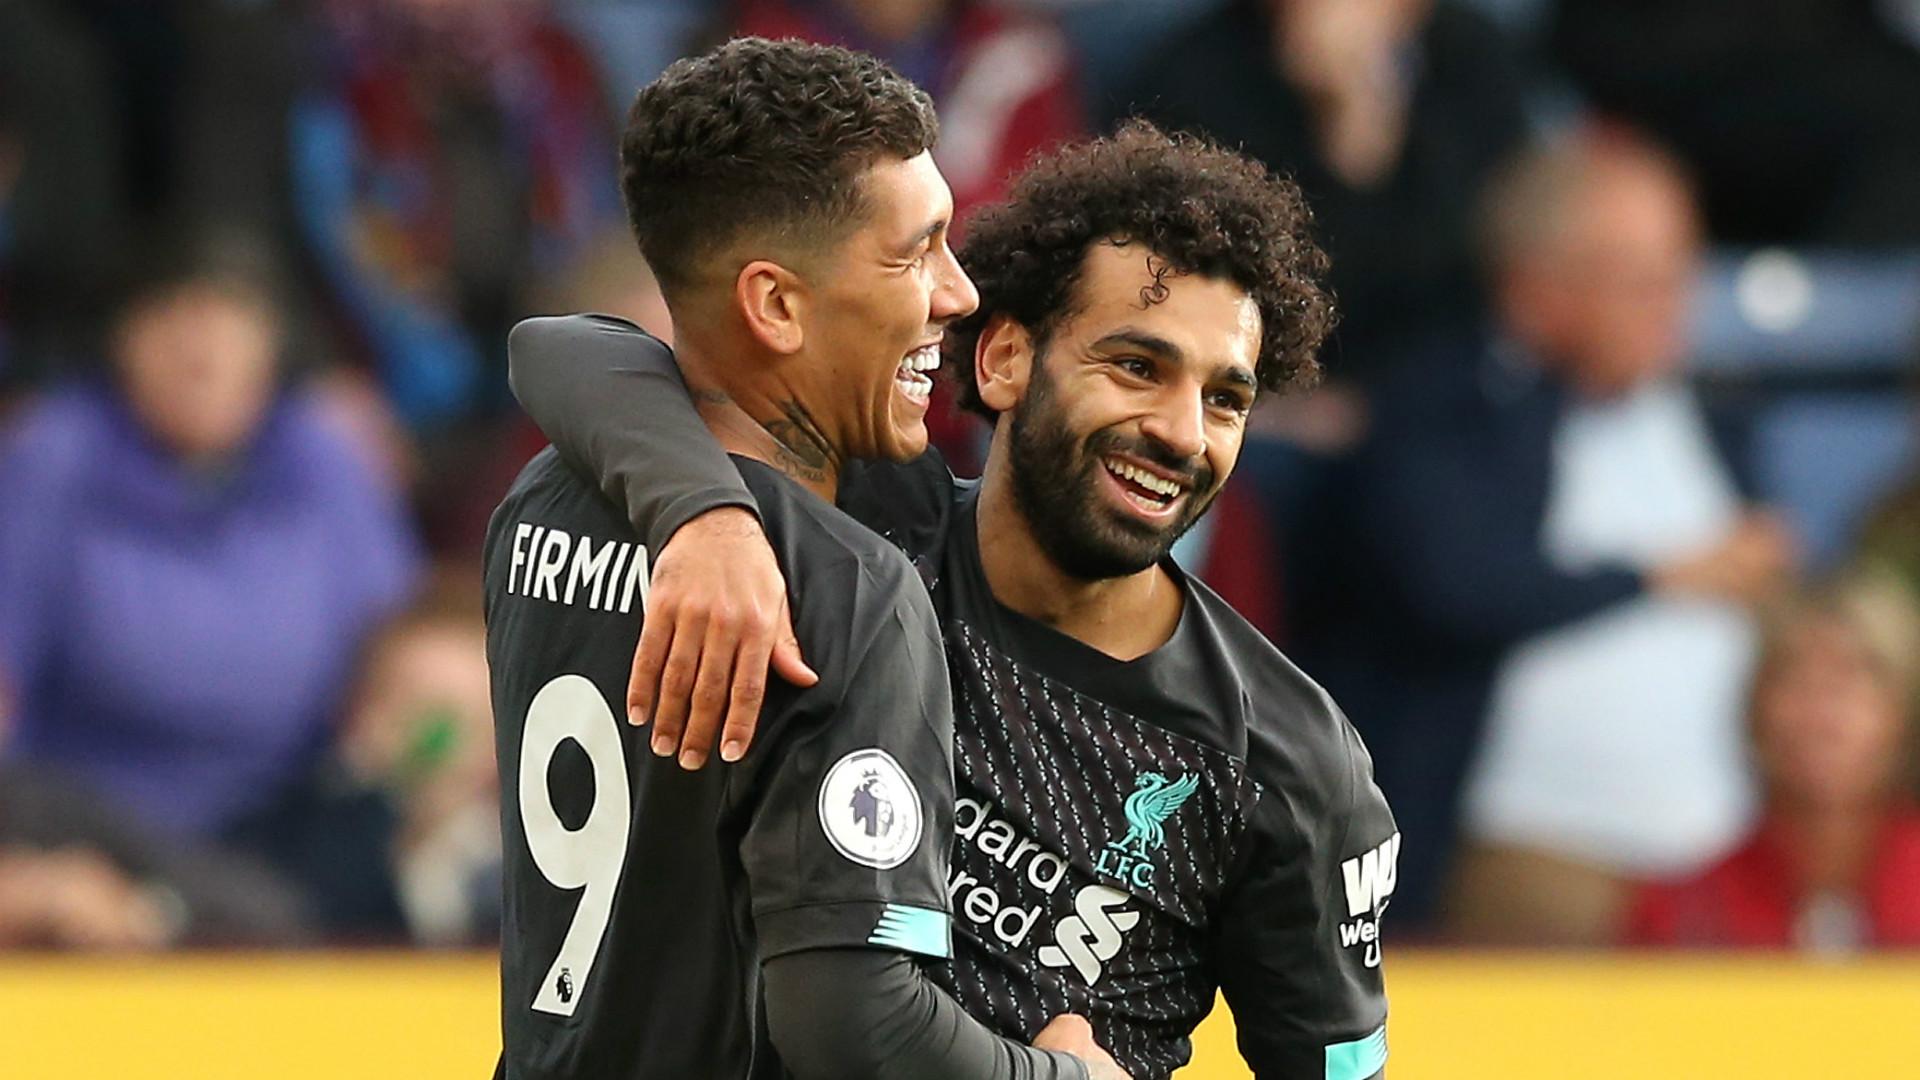 Firmino & Salah continue fruitful partnership despite Liverpool's defeat to Manchester United